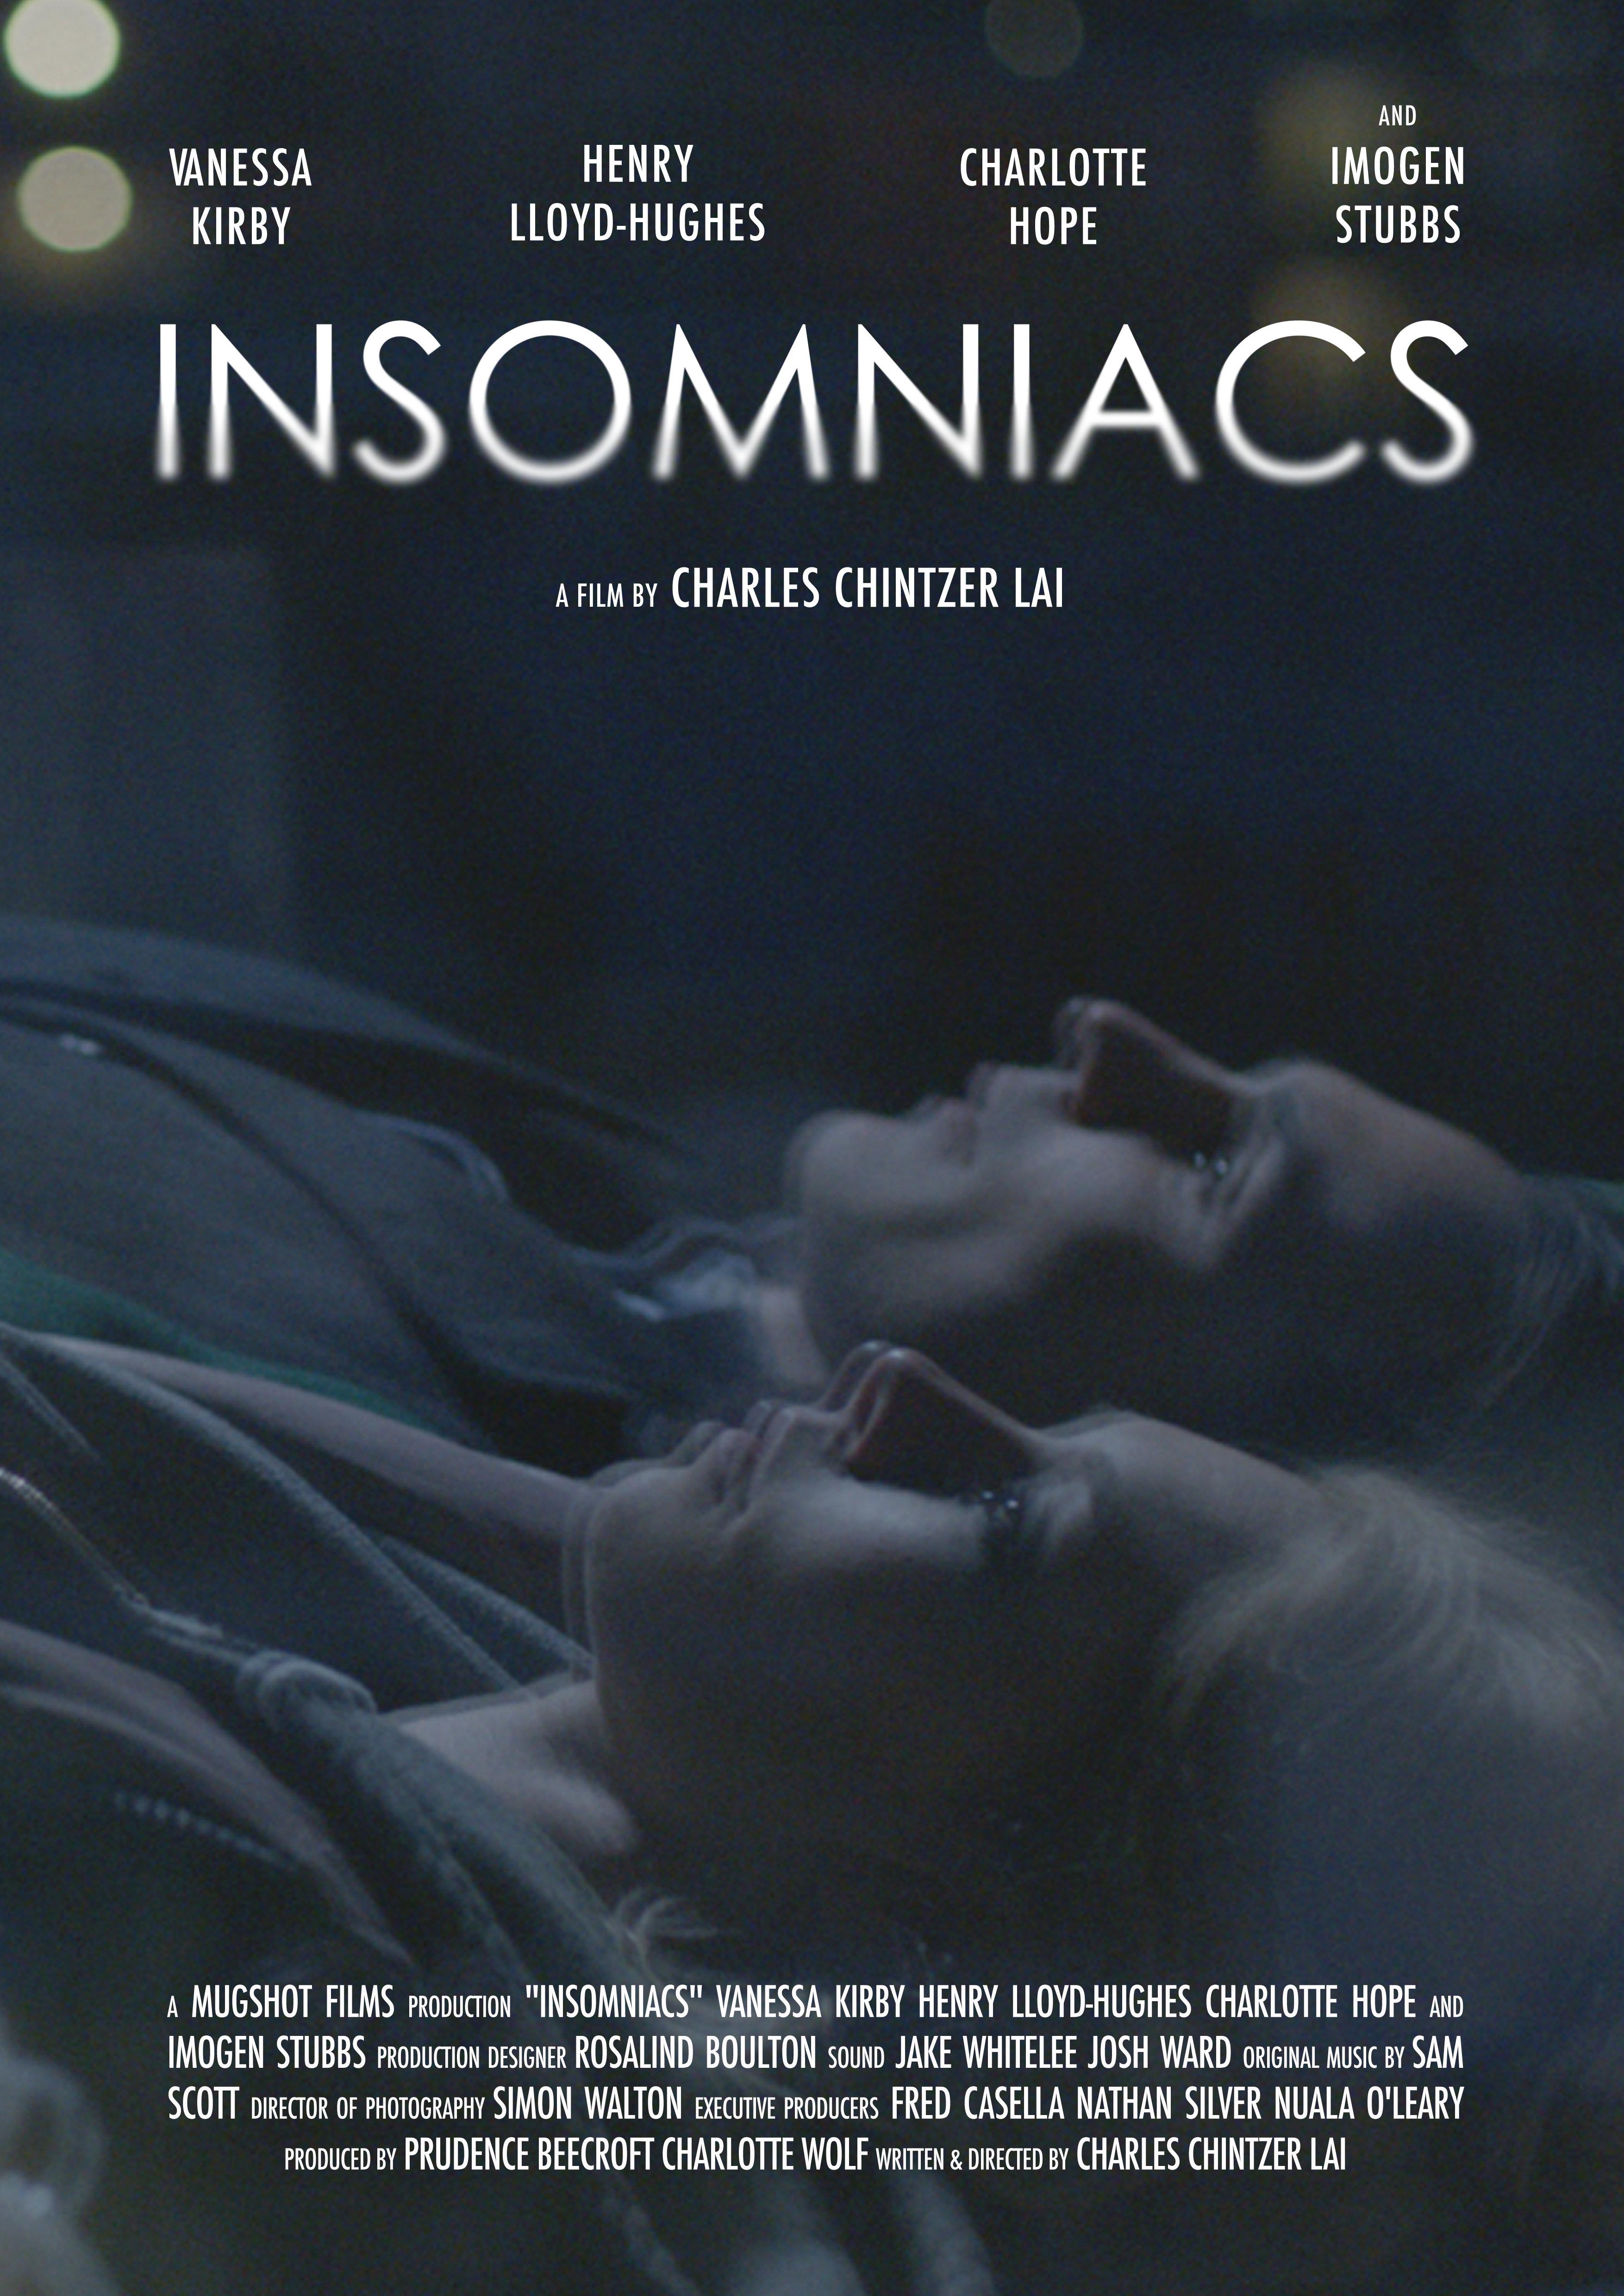 Henry Lloyd-Hughes and Vanessa Kirby in Insomniacs (2014)